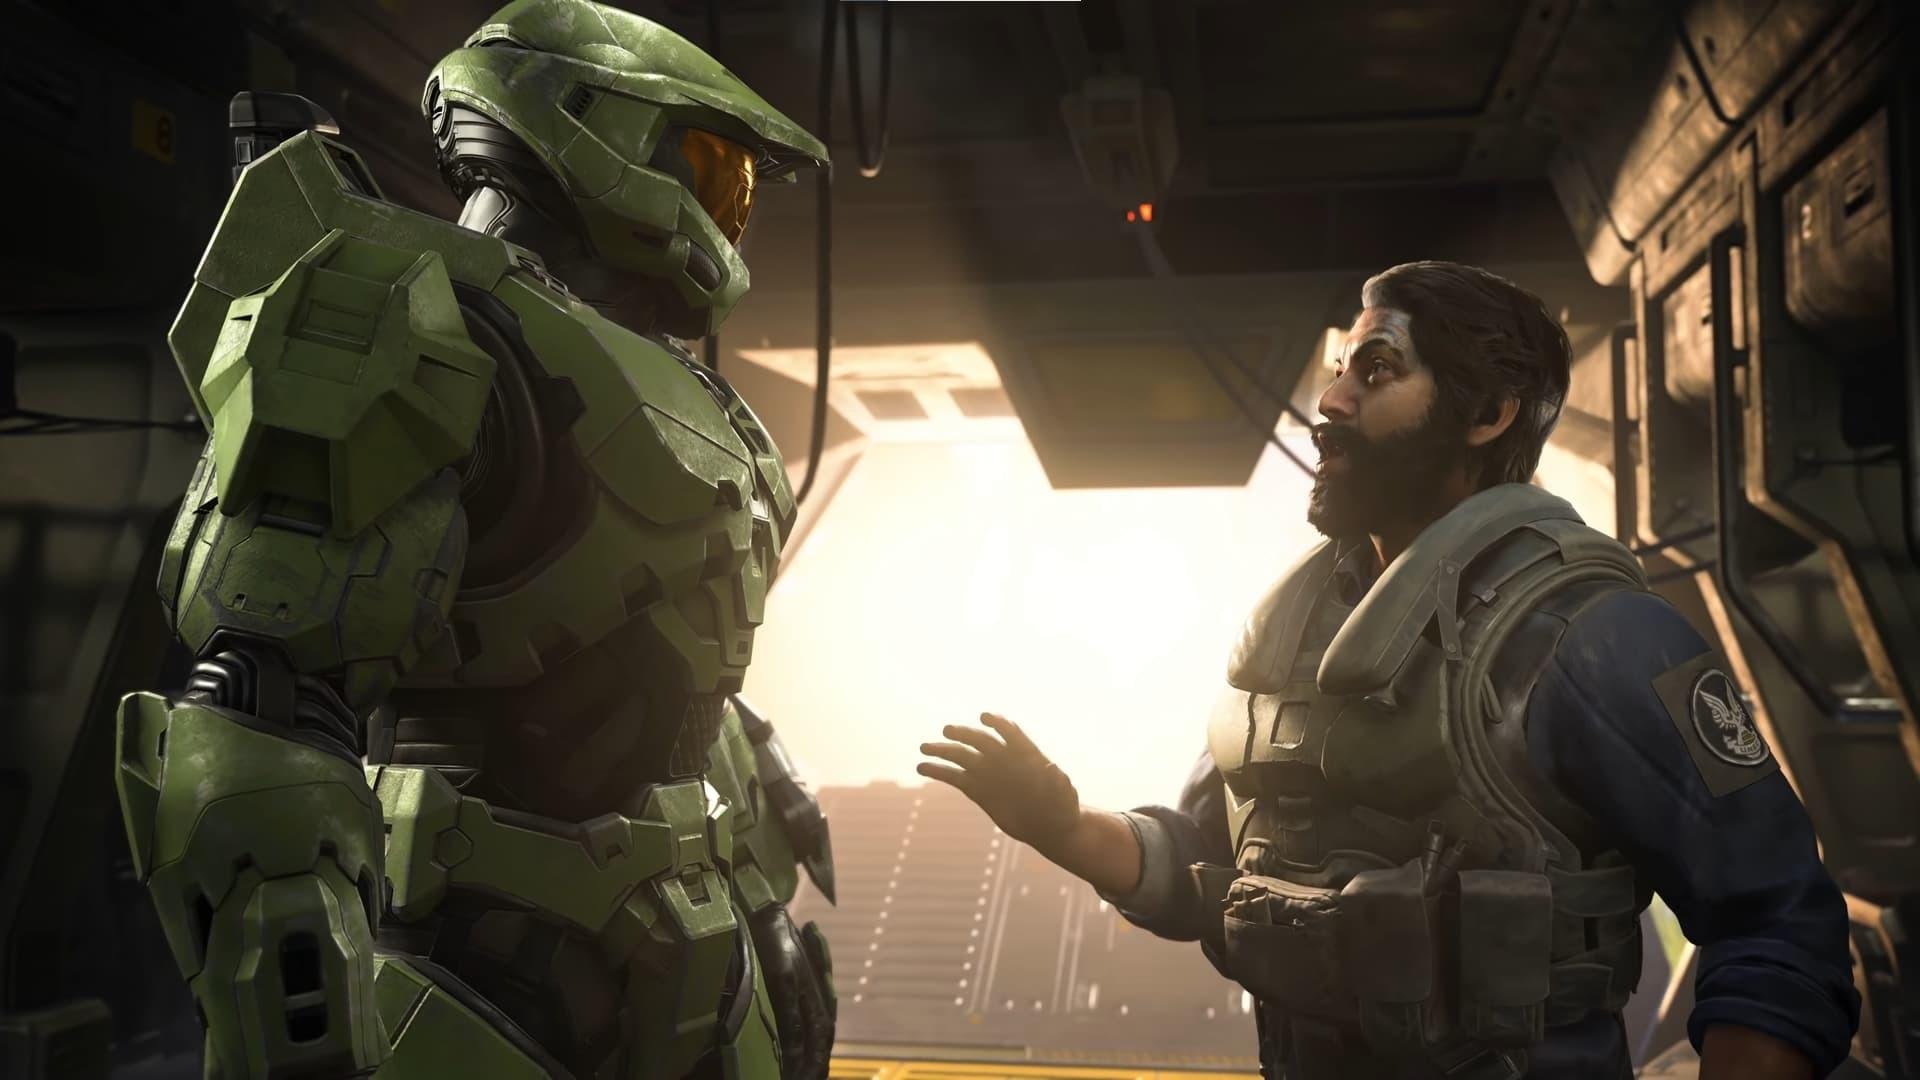 Halo infinite Chief and buddy pilot